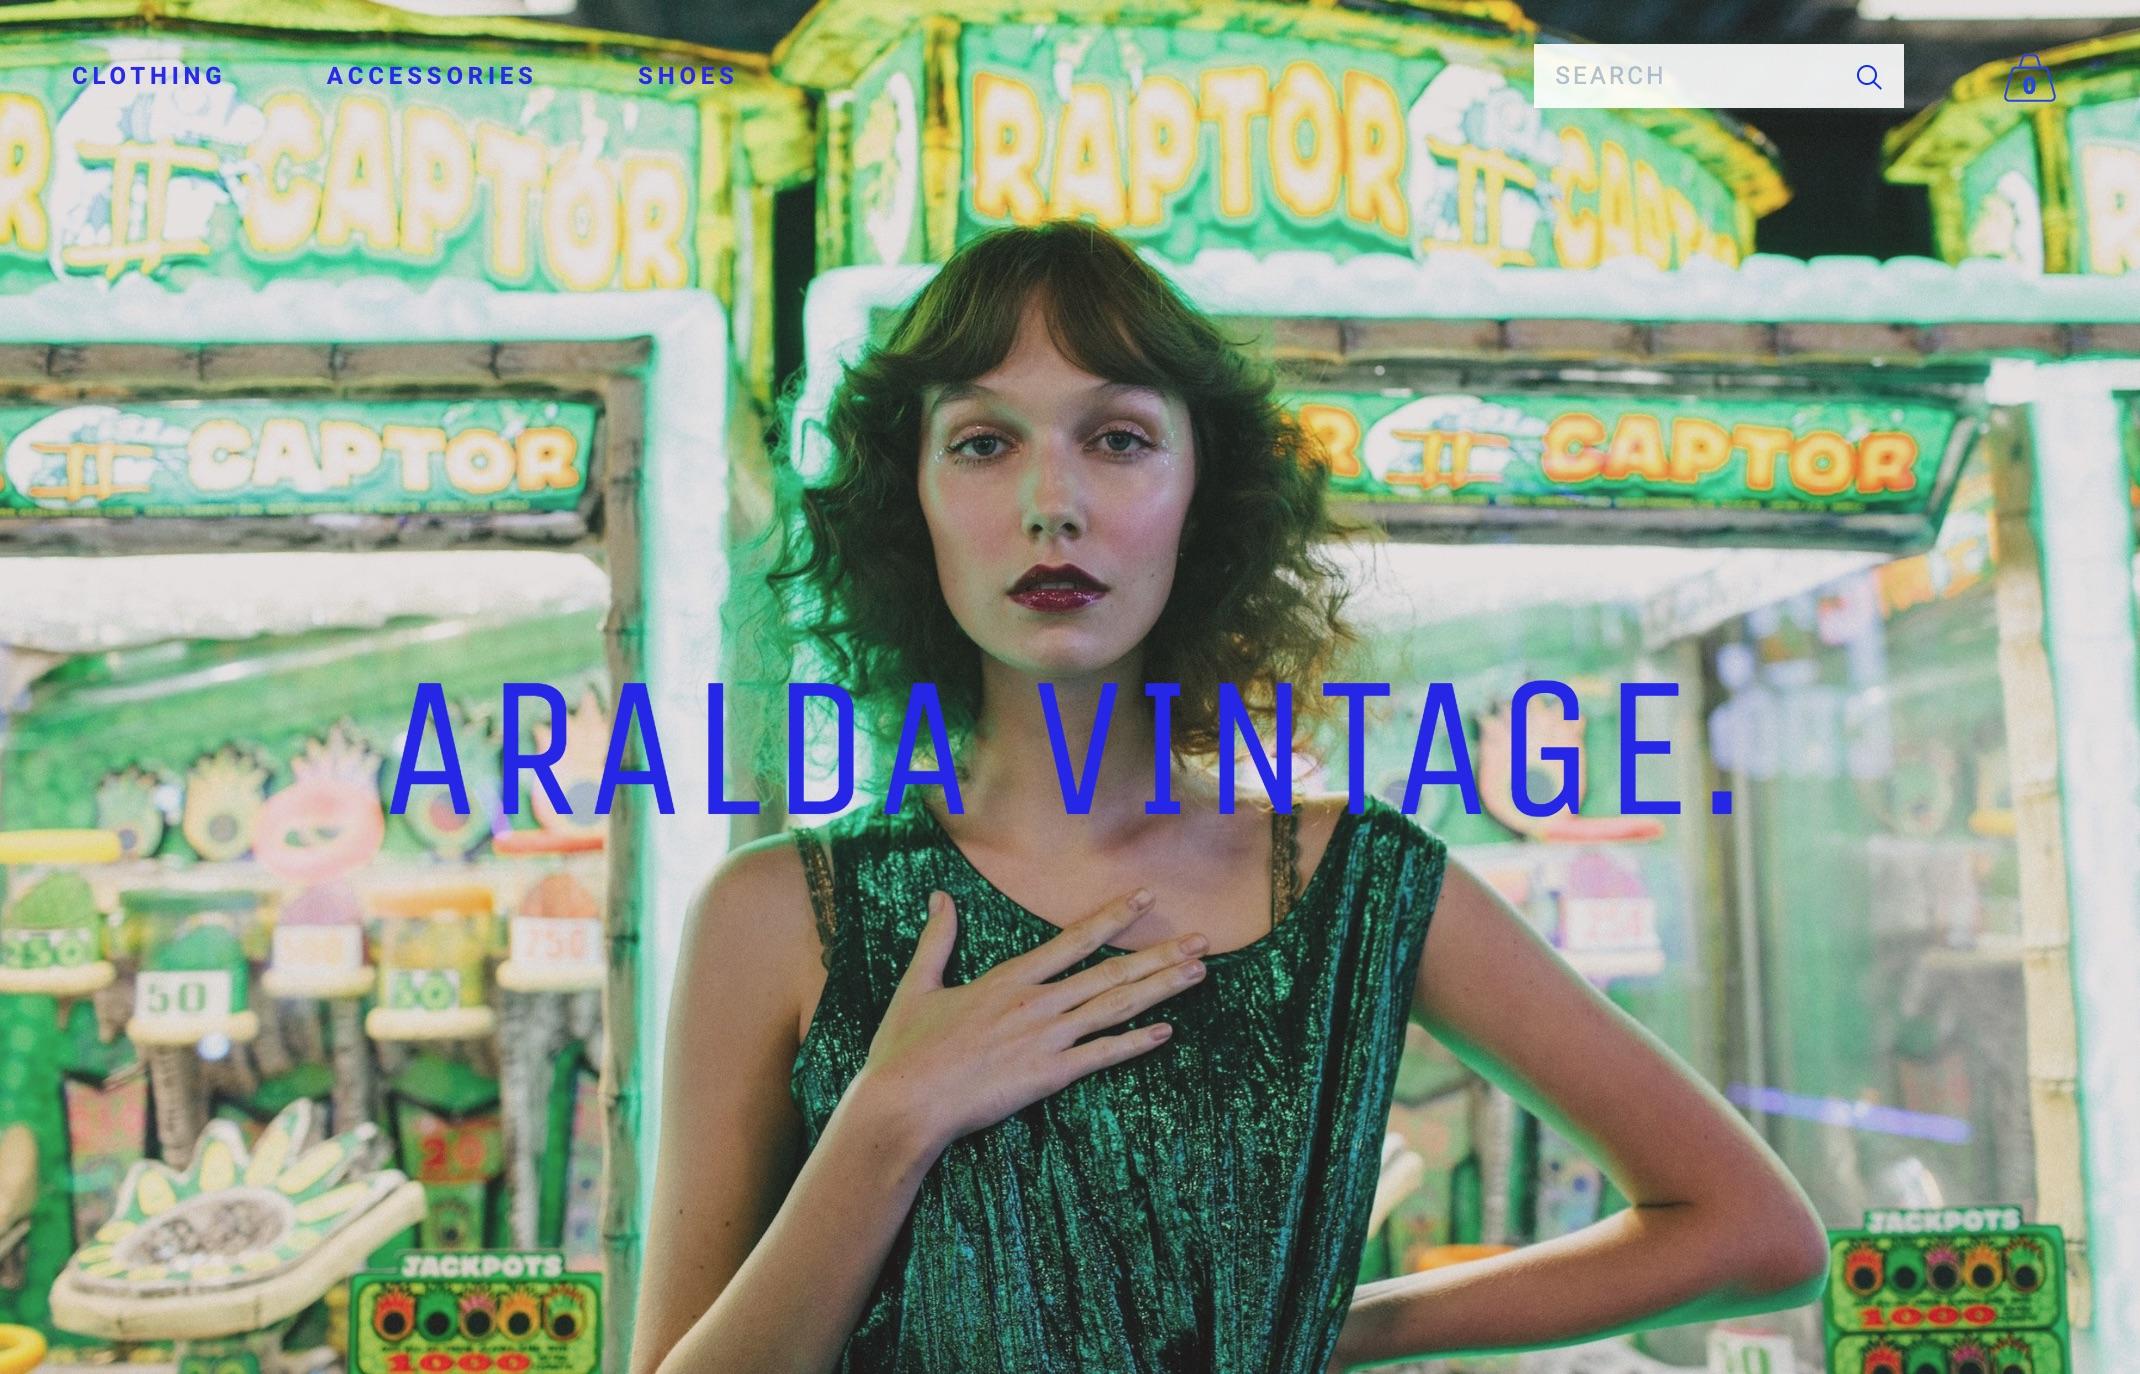 aralda vintage [fashion]